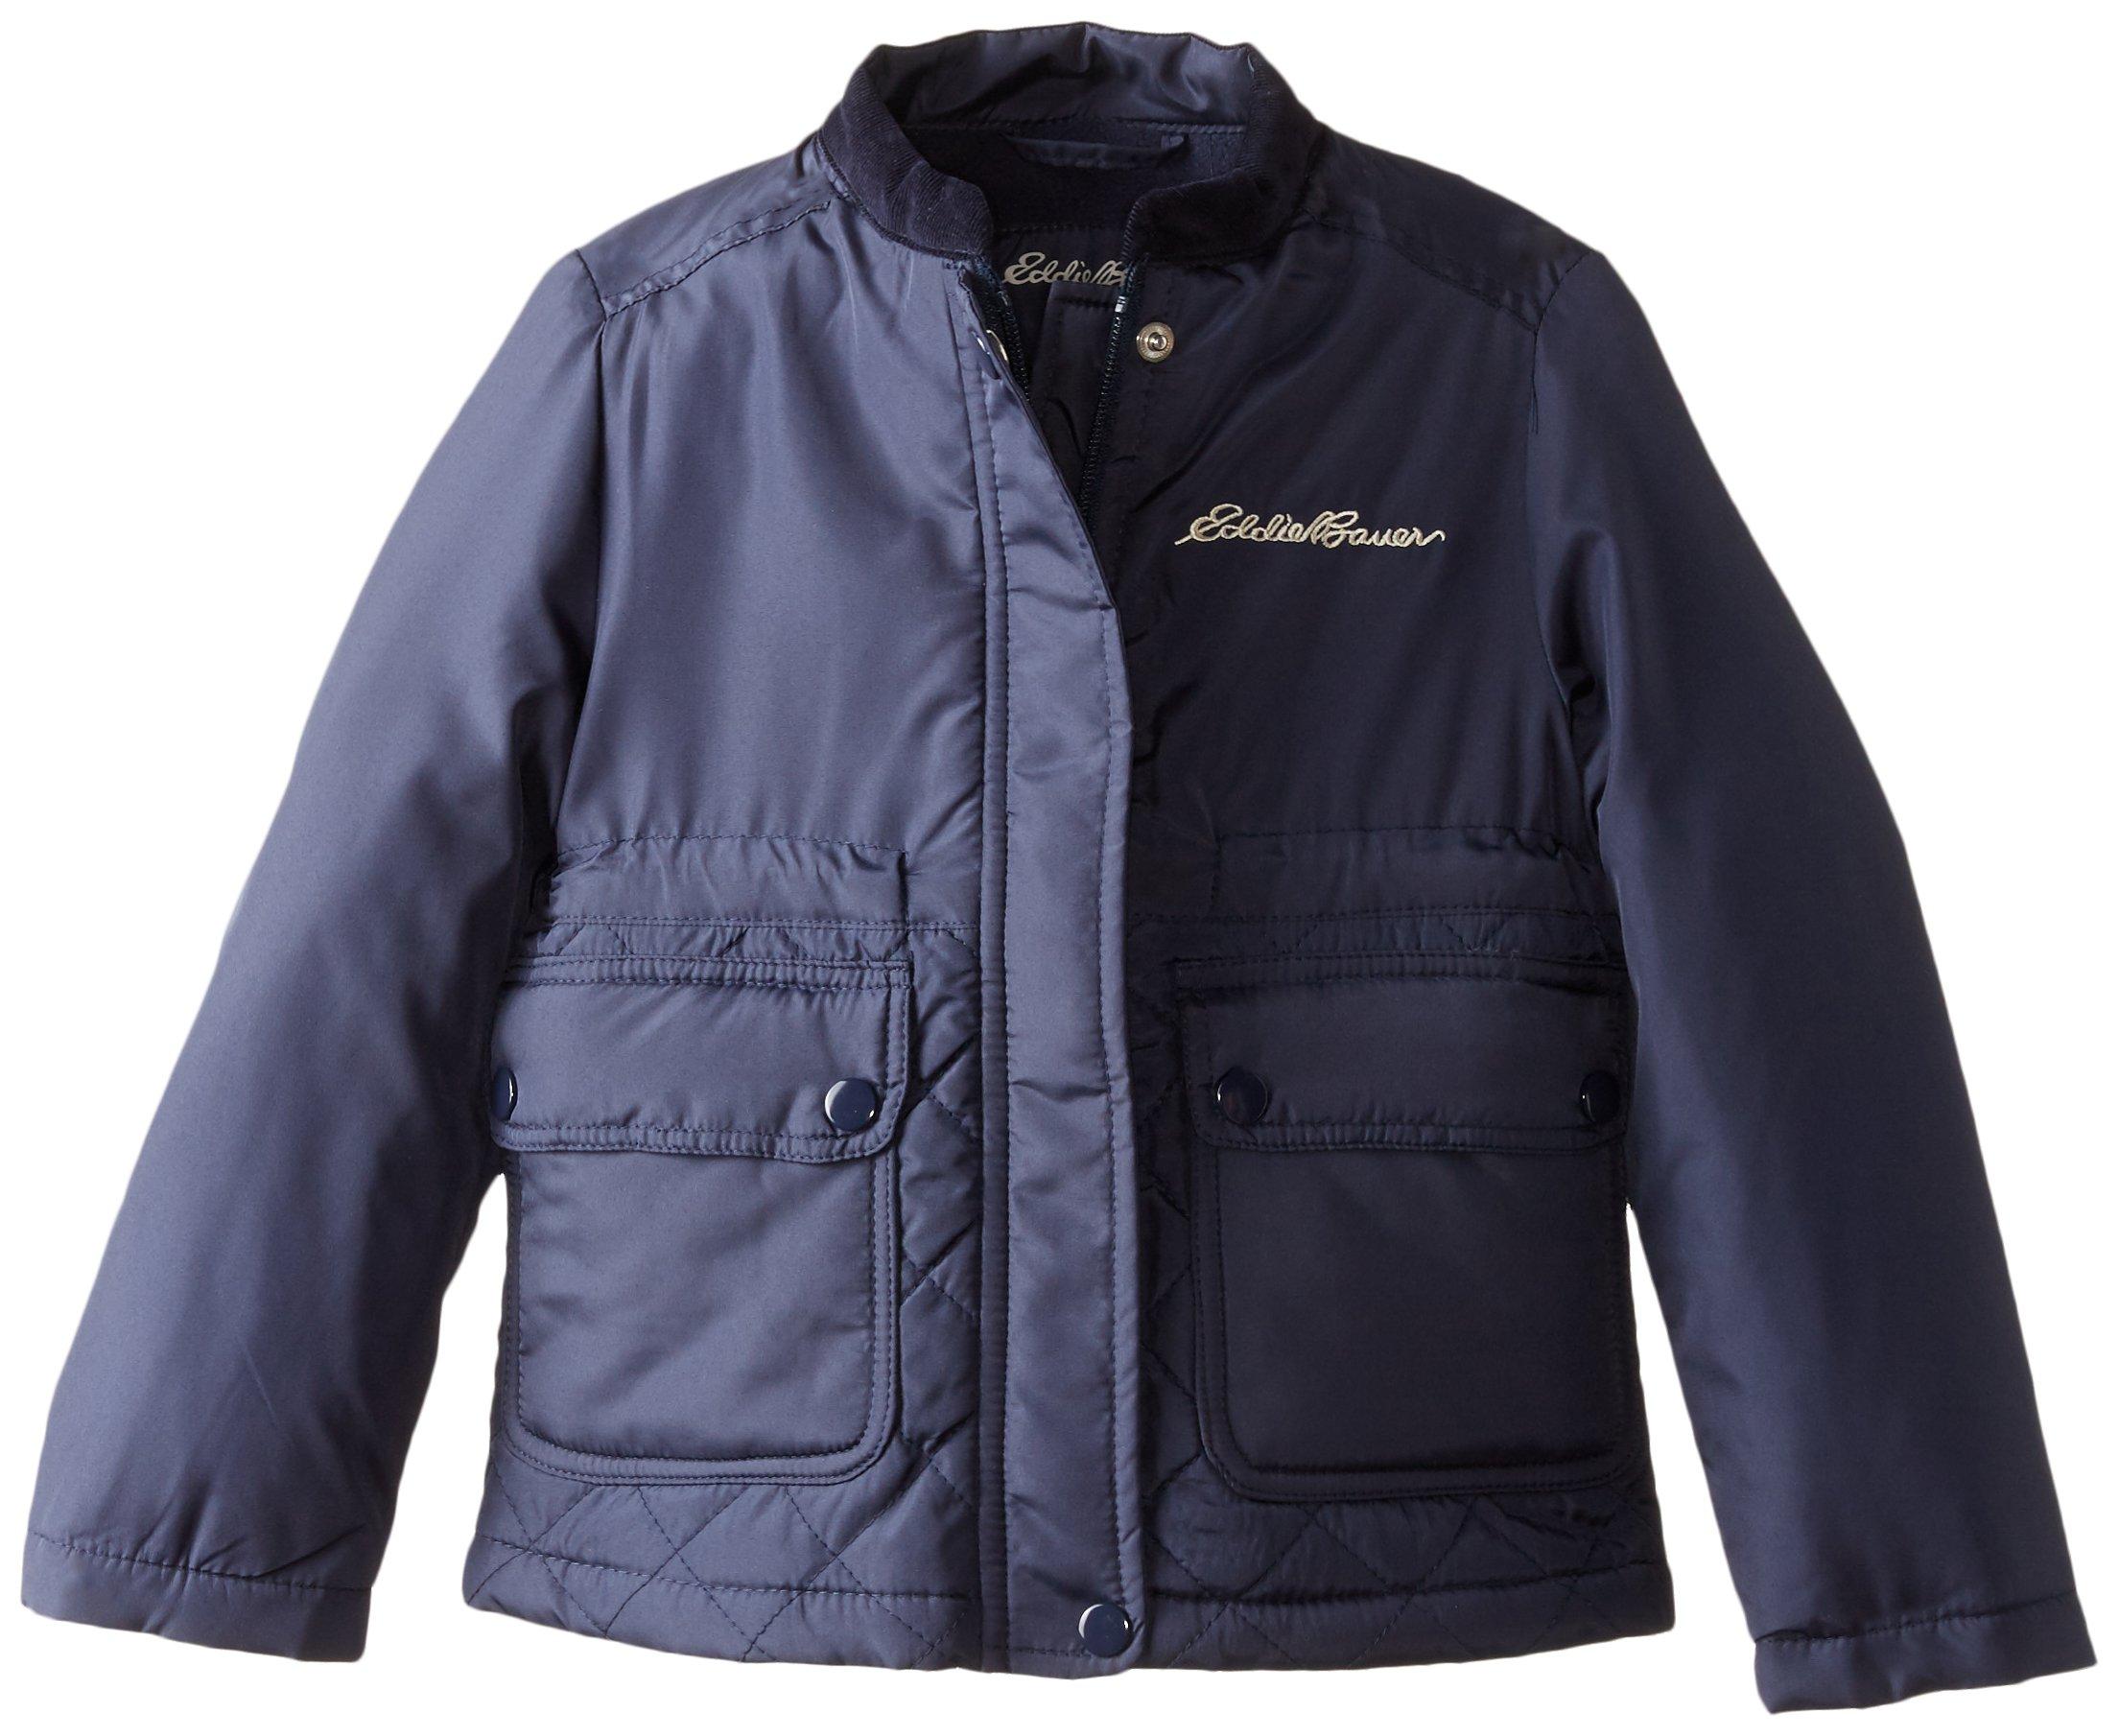 Eddie Bauer Little Girls' Jacket (More Styles Available), Navy-IIIBGA, 4